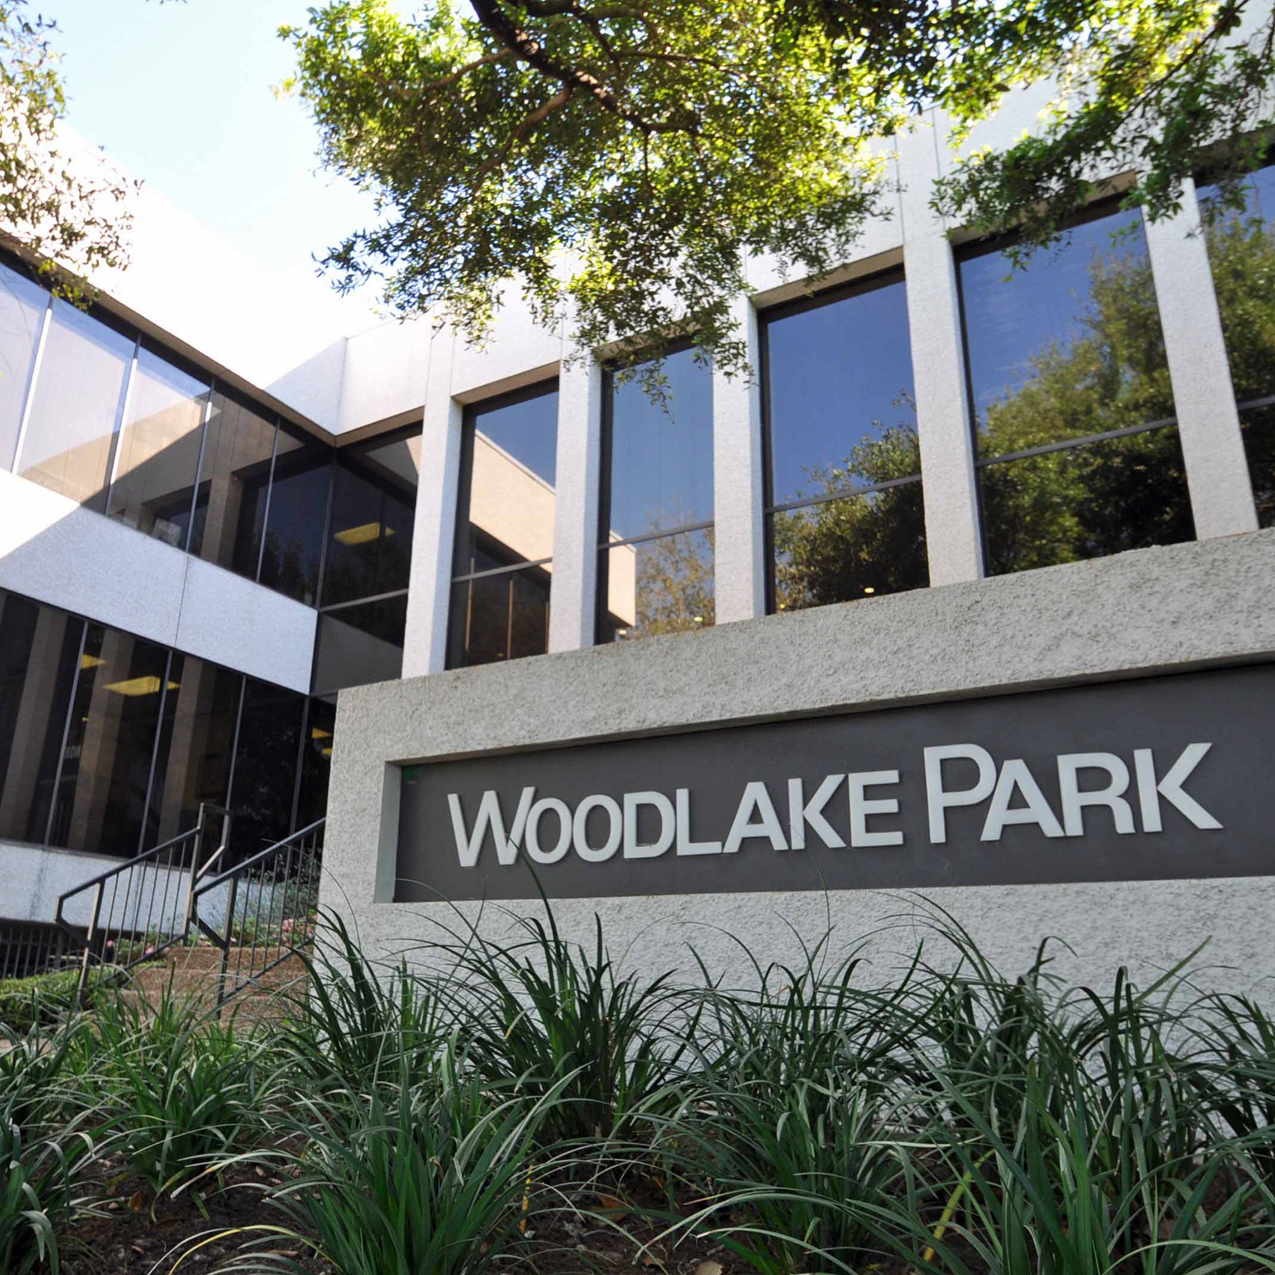 COMMERCIAL REAL ESTATE  Woodlake Park